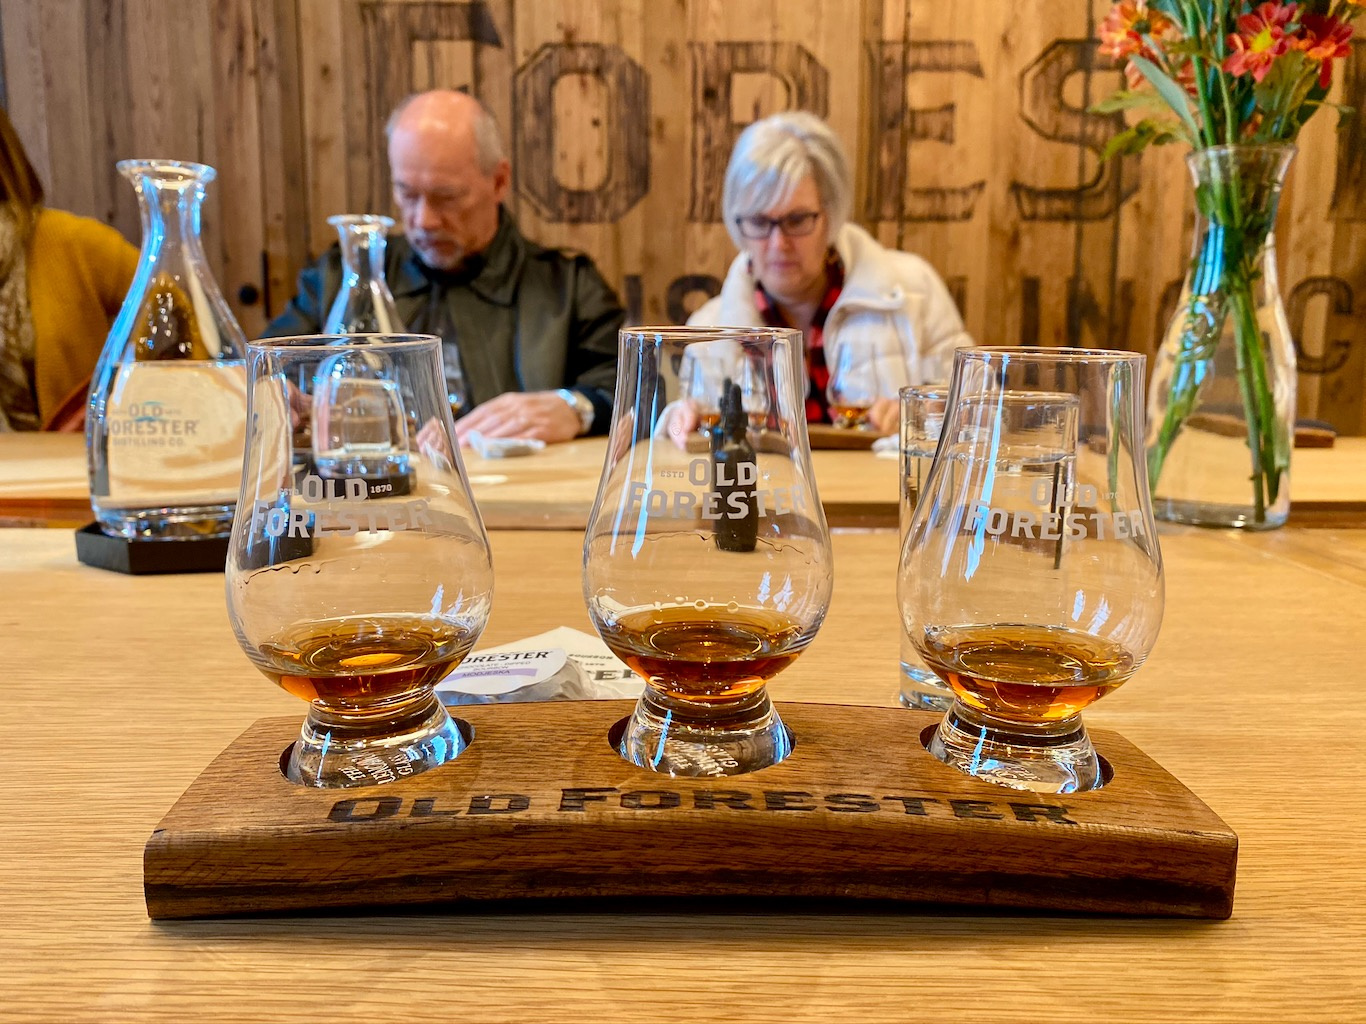 Bourbon Tasting - Old Forester Distillery